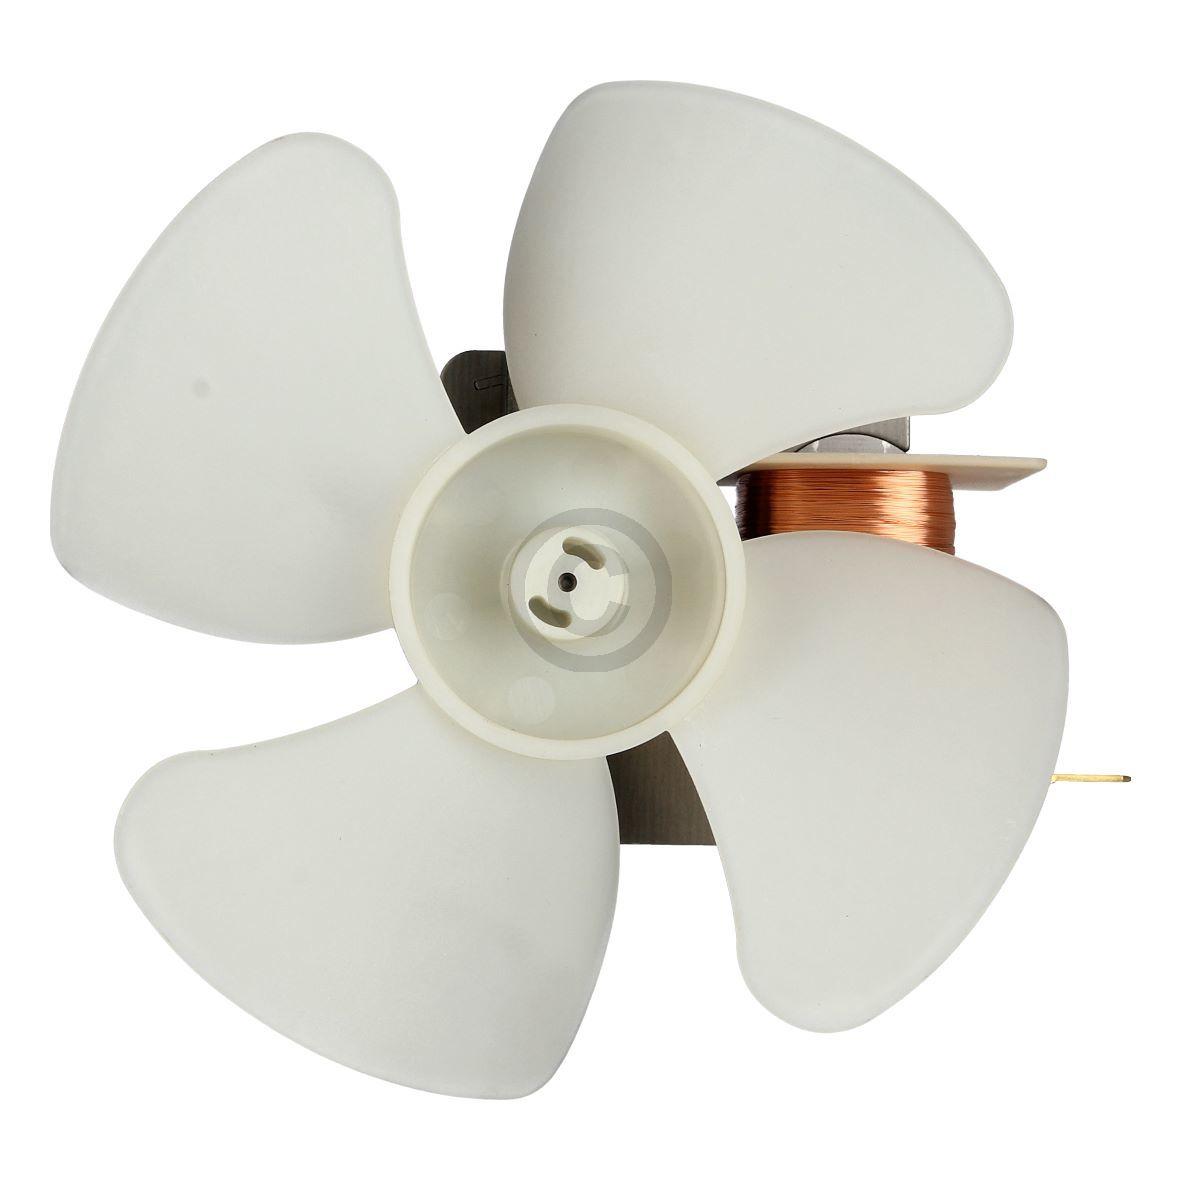 Heißluftherdventilator 00490780 490780 Bosch, Siemens, Neff